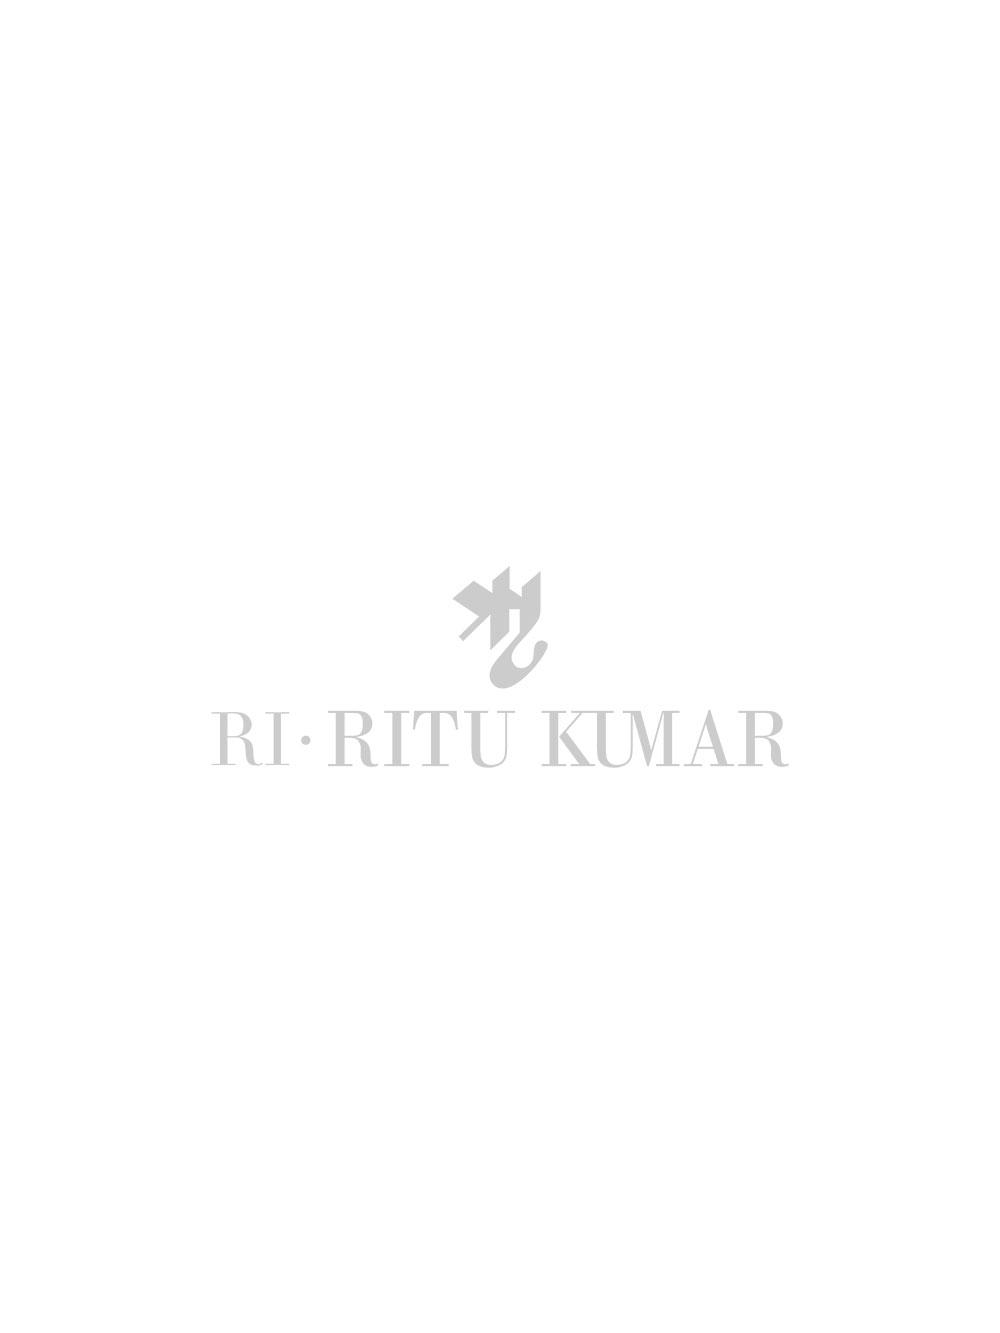 Fuchsia & Black Embroidered Kurta With Dupatta And Skirt